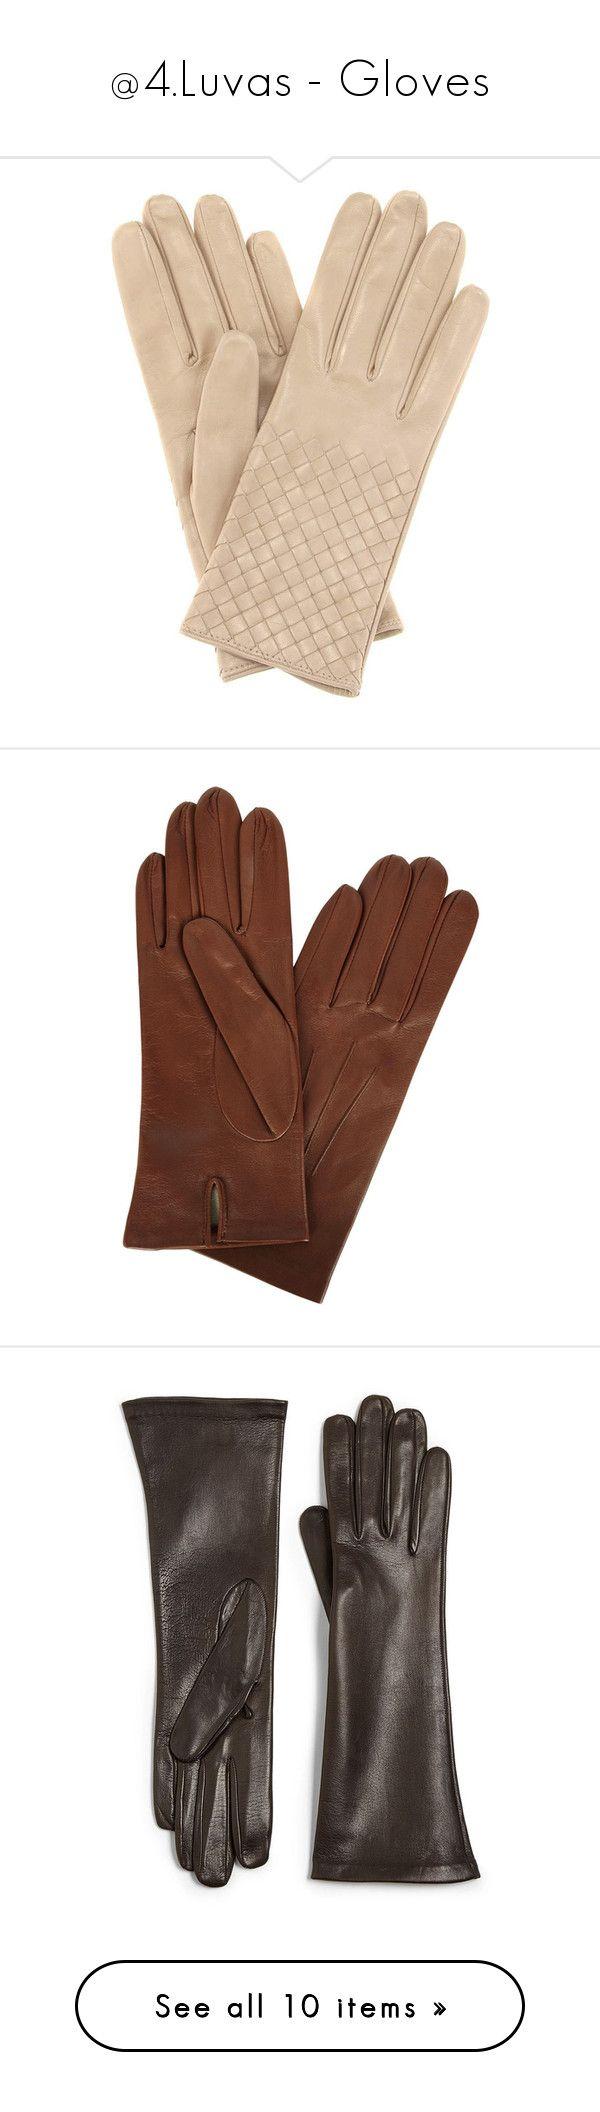 """@4.Luvas - Gloves"" by rafakeka on Polyvore featuring accessories, gloves, beige, beige gloves, beige leather gloves, bottega veneta, real leather gloves, leather gloves, brown e vintage gloves"